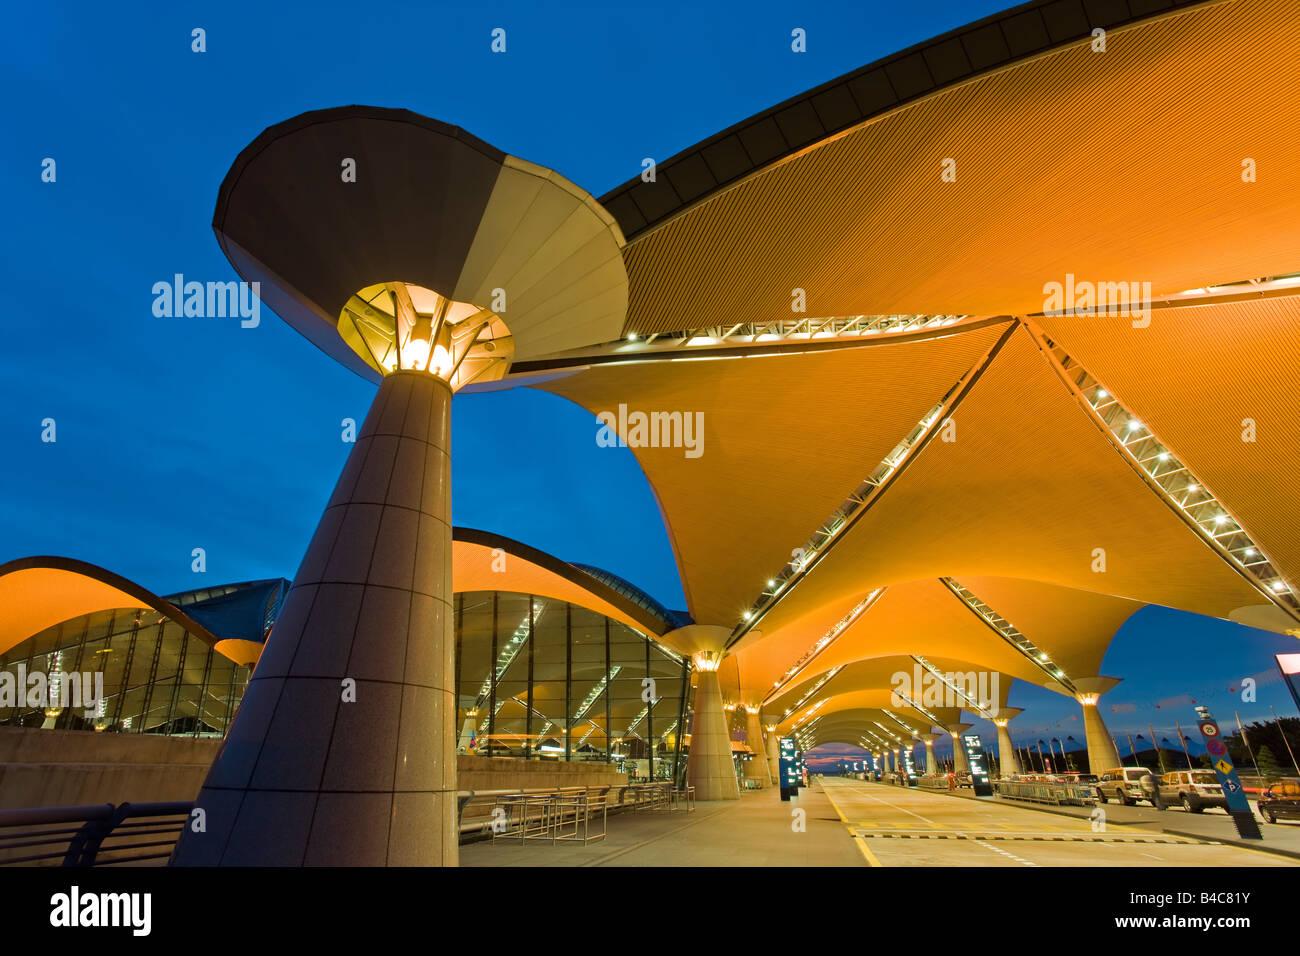 Asien, Malaysia, Kuala Lumpur, Kuala Lumpur International Airport, KLIA, moderne Außenarchitektur Stockbild